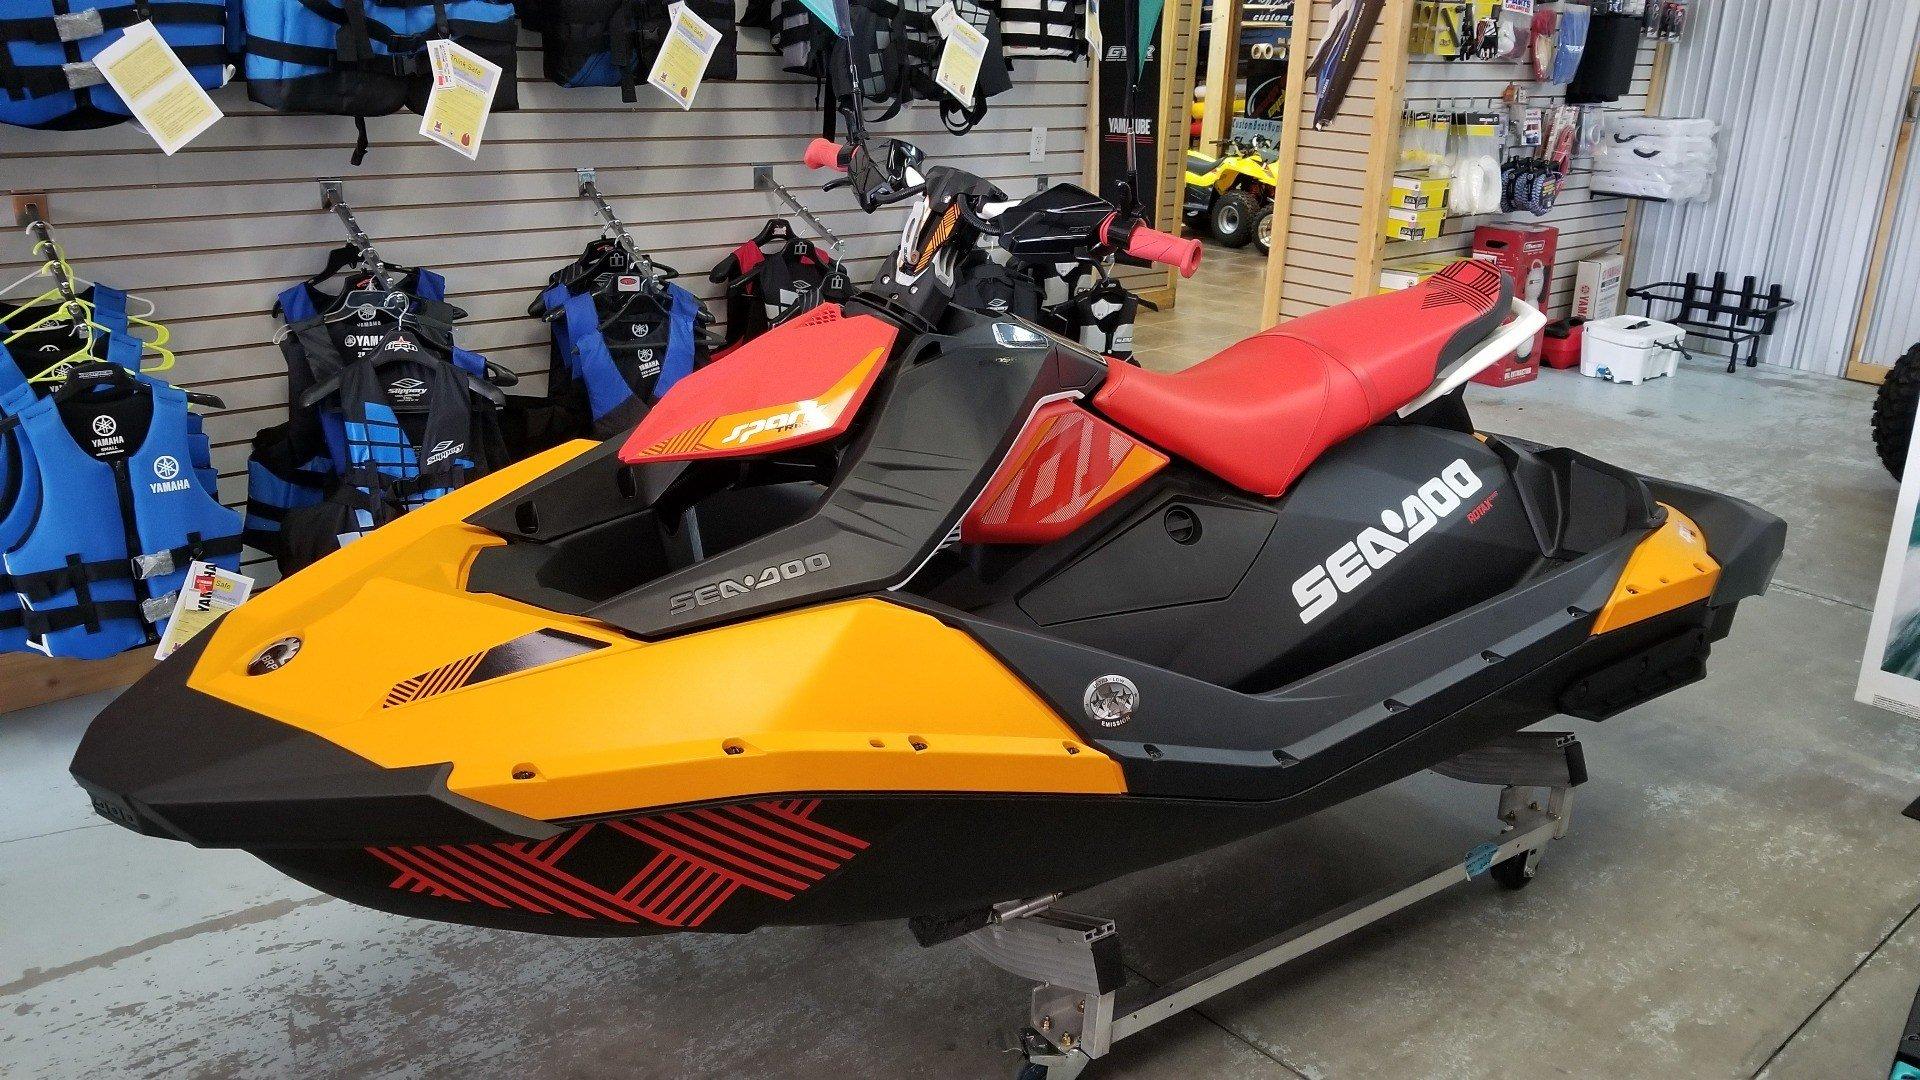 2018 Sea-Doo Spark 3up Trixx iBR for sale 92031